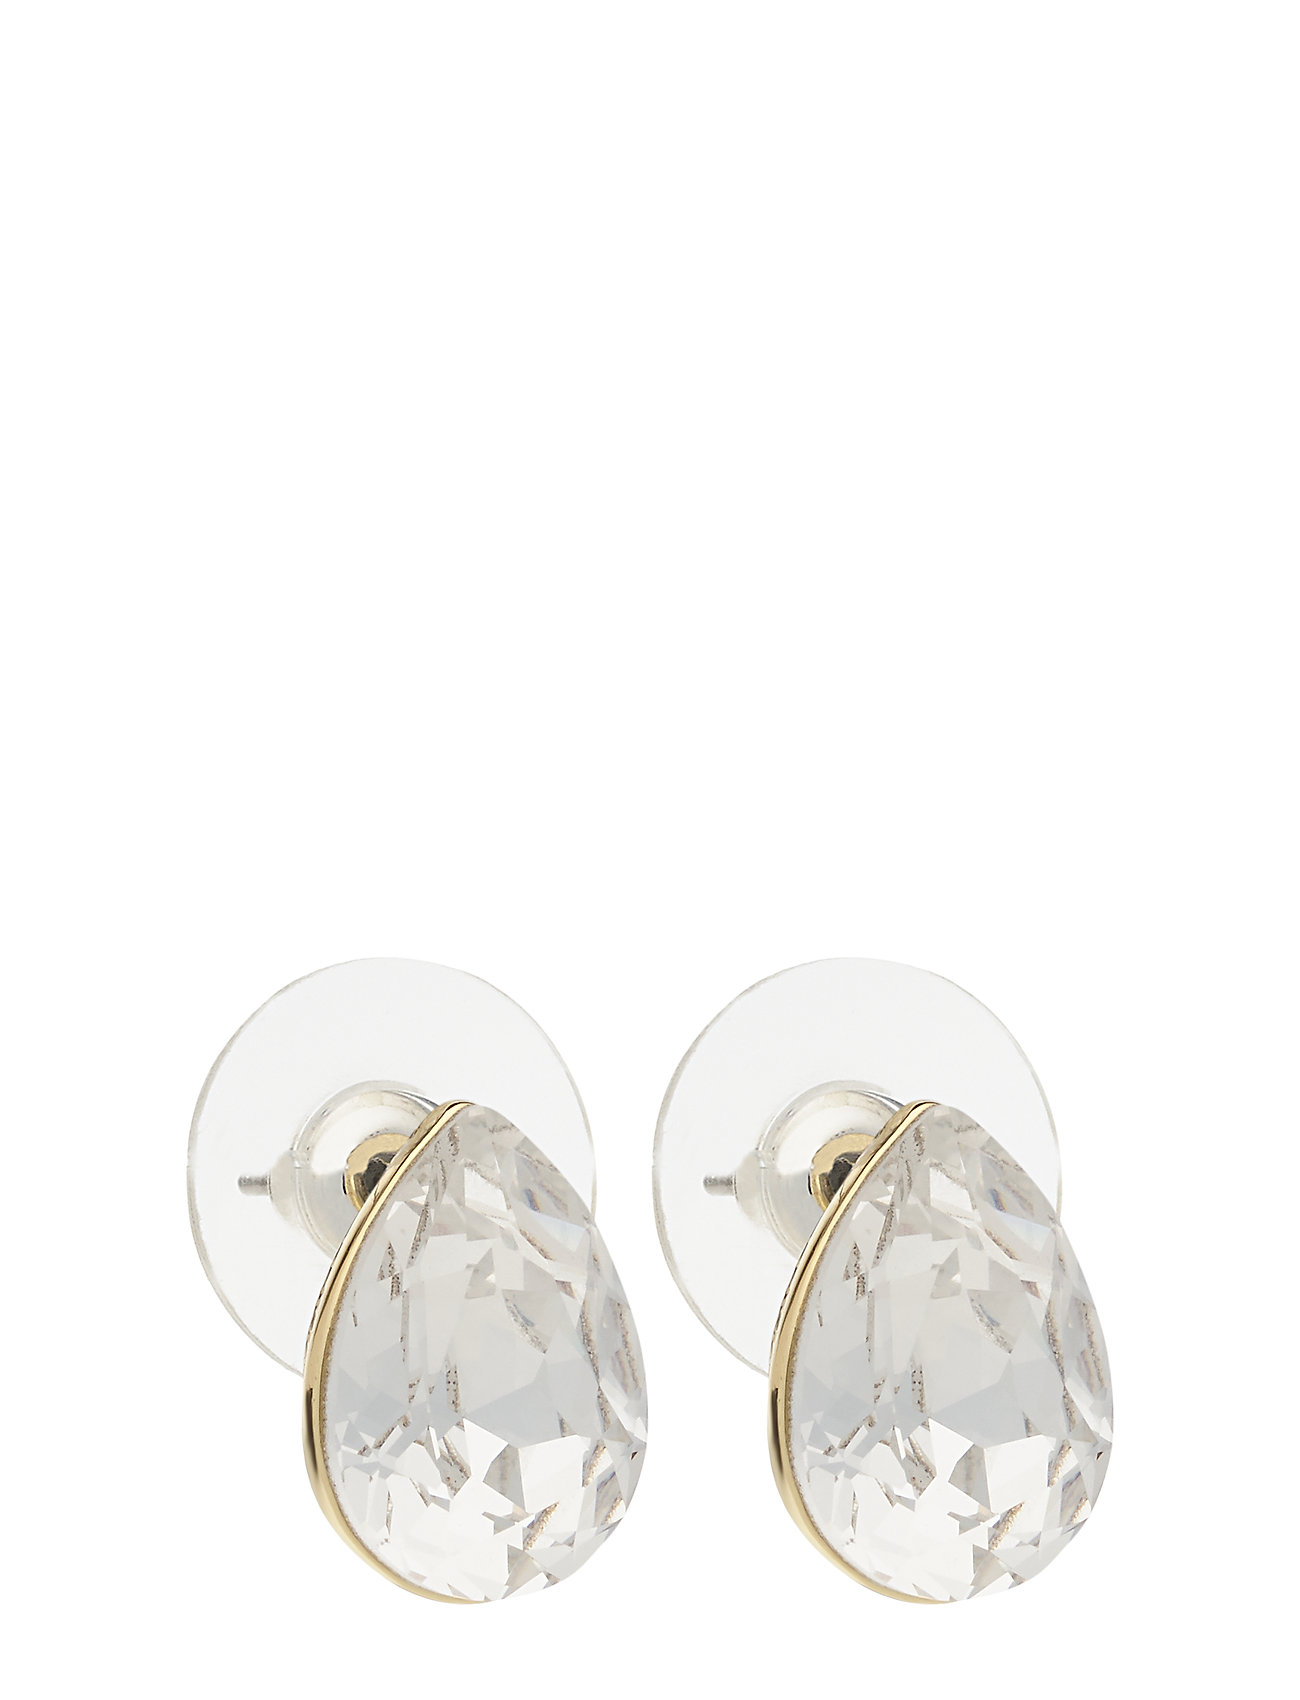 Image of West Broadway Ear Accessories Jewellery Earrings Studs Sølv SNÖ Of Sweden (3270672873)